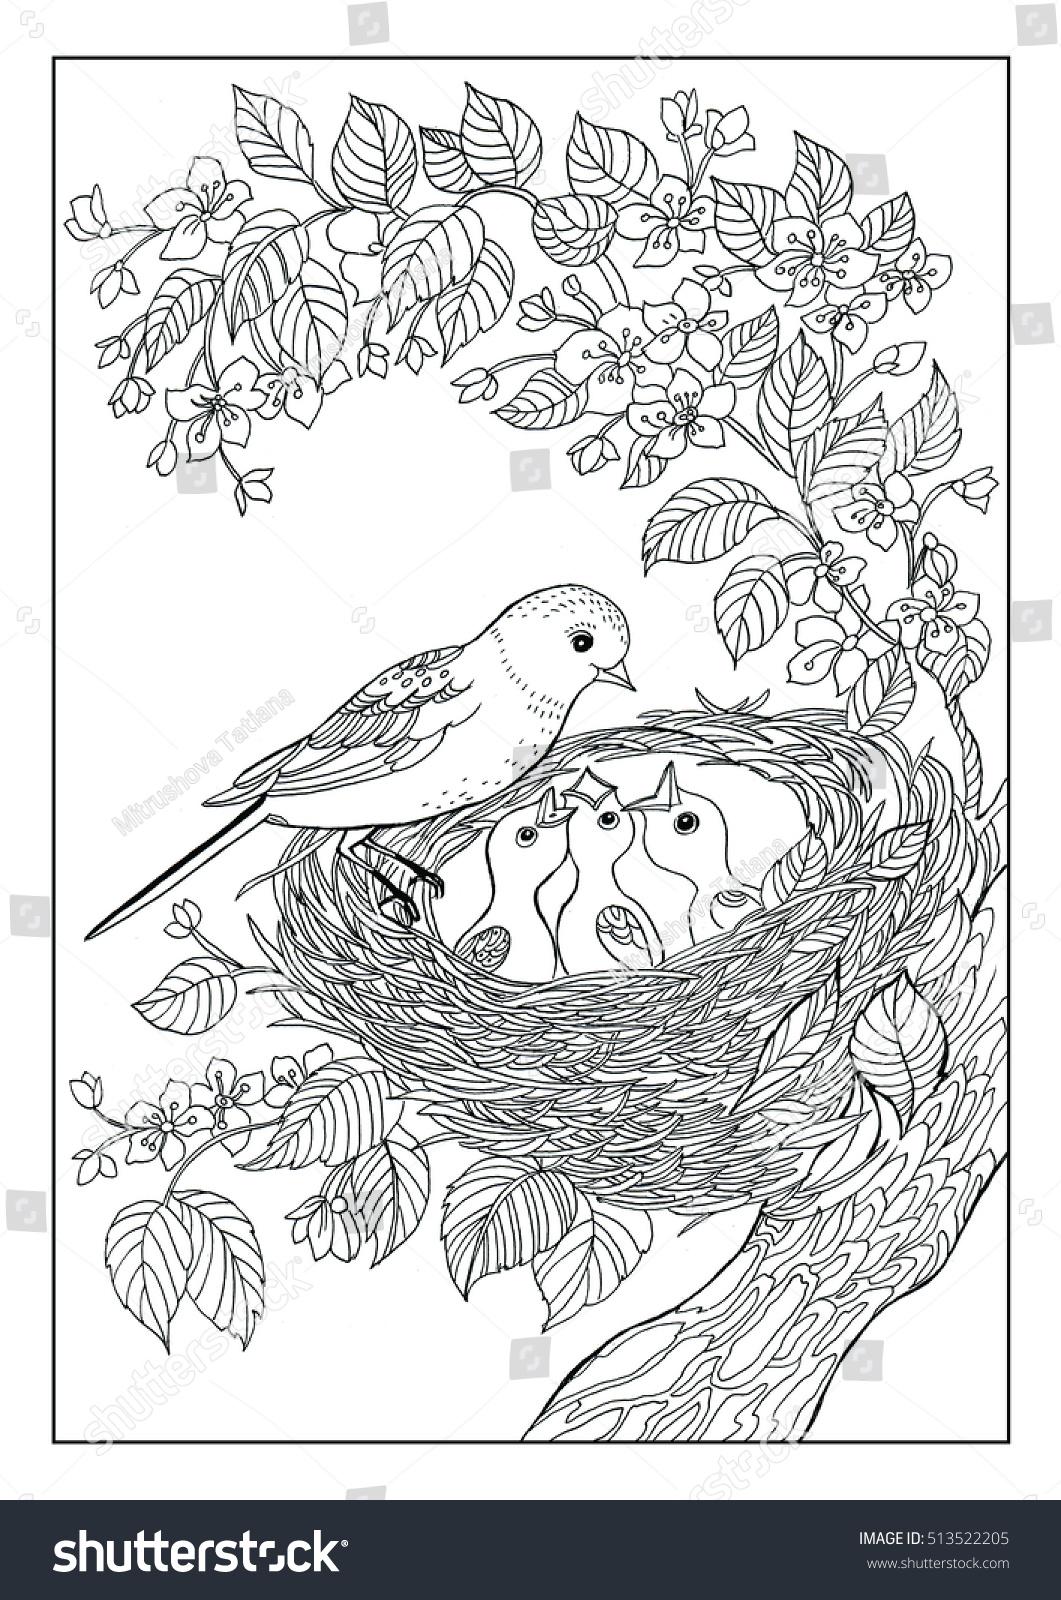 Coloring Book Twenty Pages Birds Nest Stock Illustration 513522205 ...